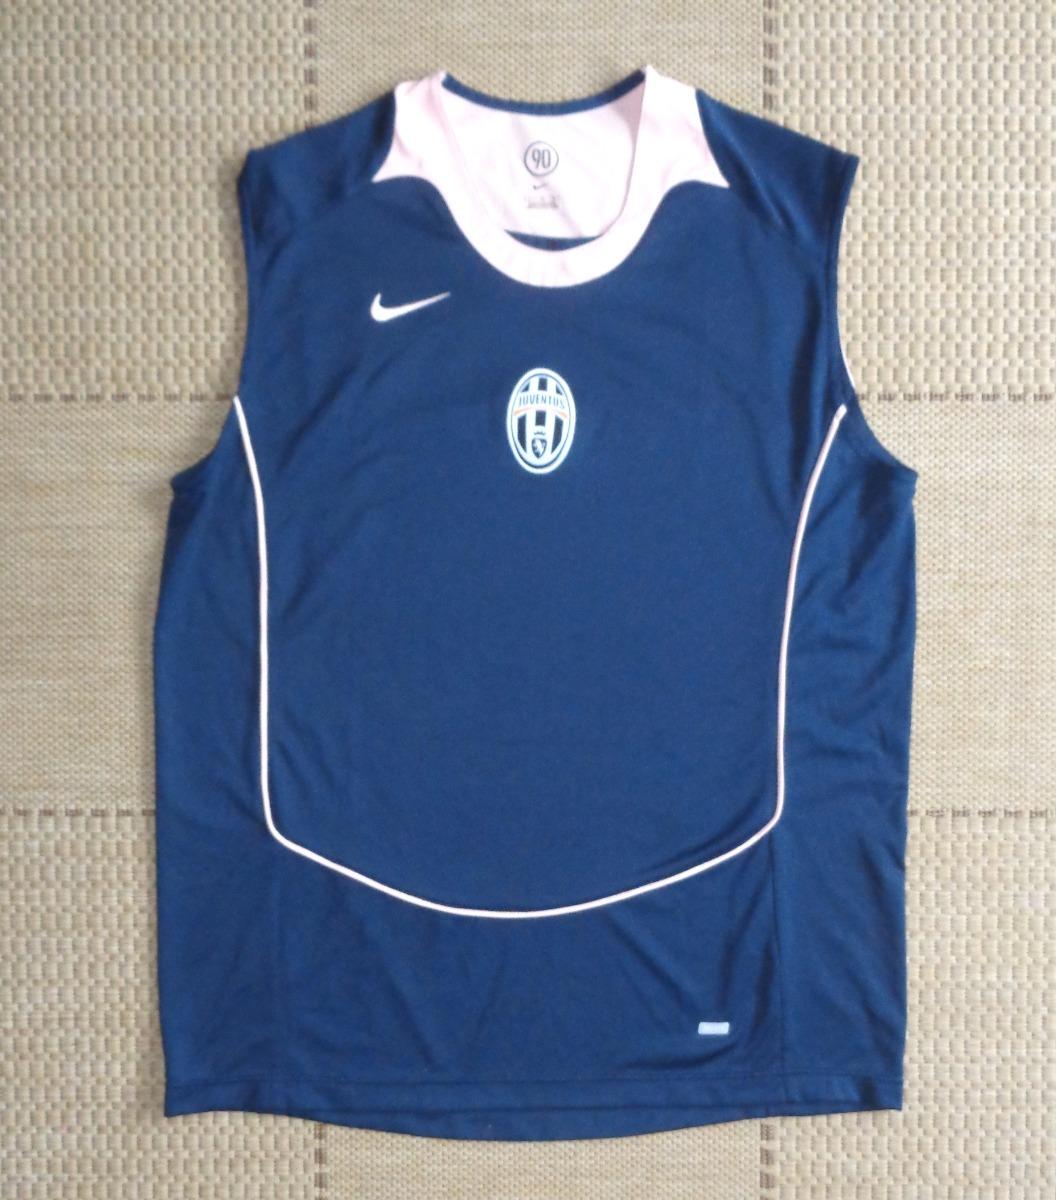 camisa original juventus 2004 2005 treino regata. Carregando zoom. 6bfb9e0f78682